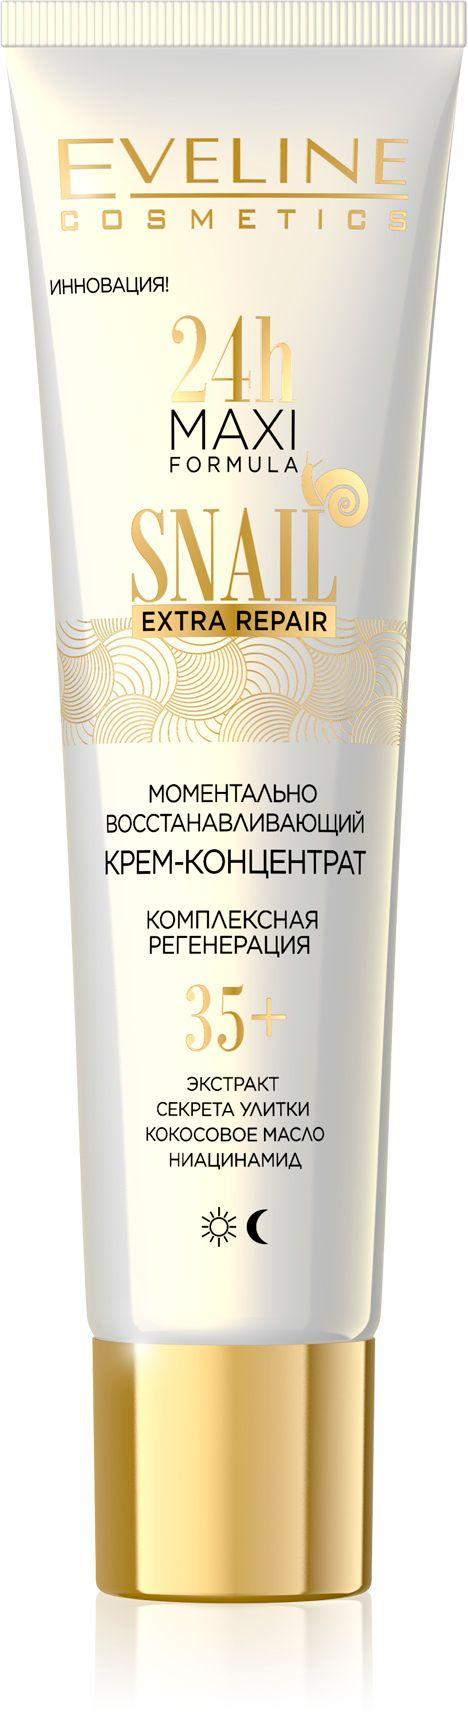 Instantly regenerating cream concentrate 35+ series 24h maxi formula, Avon, 40 ml